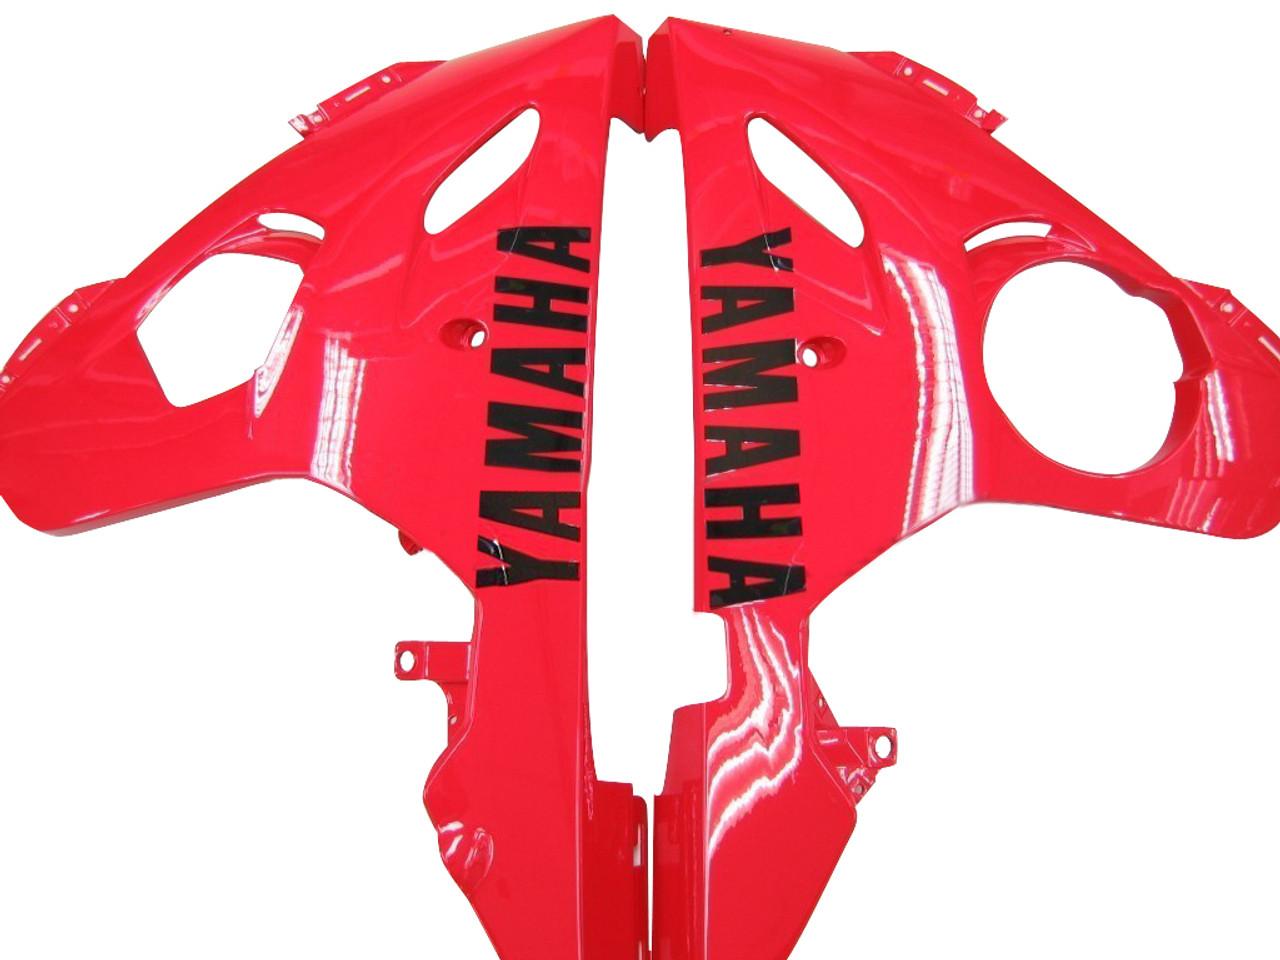 Fairings Yamaha YZF-R6 White & Red R6 Racing (2003-2005)